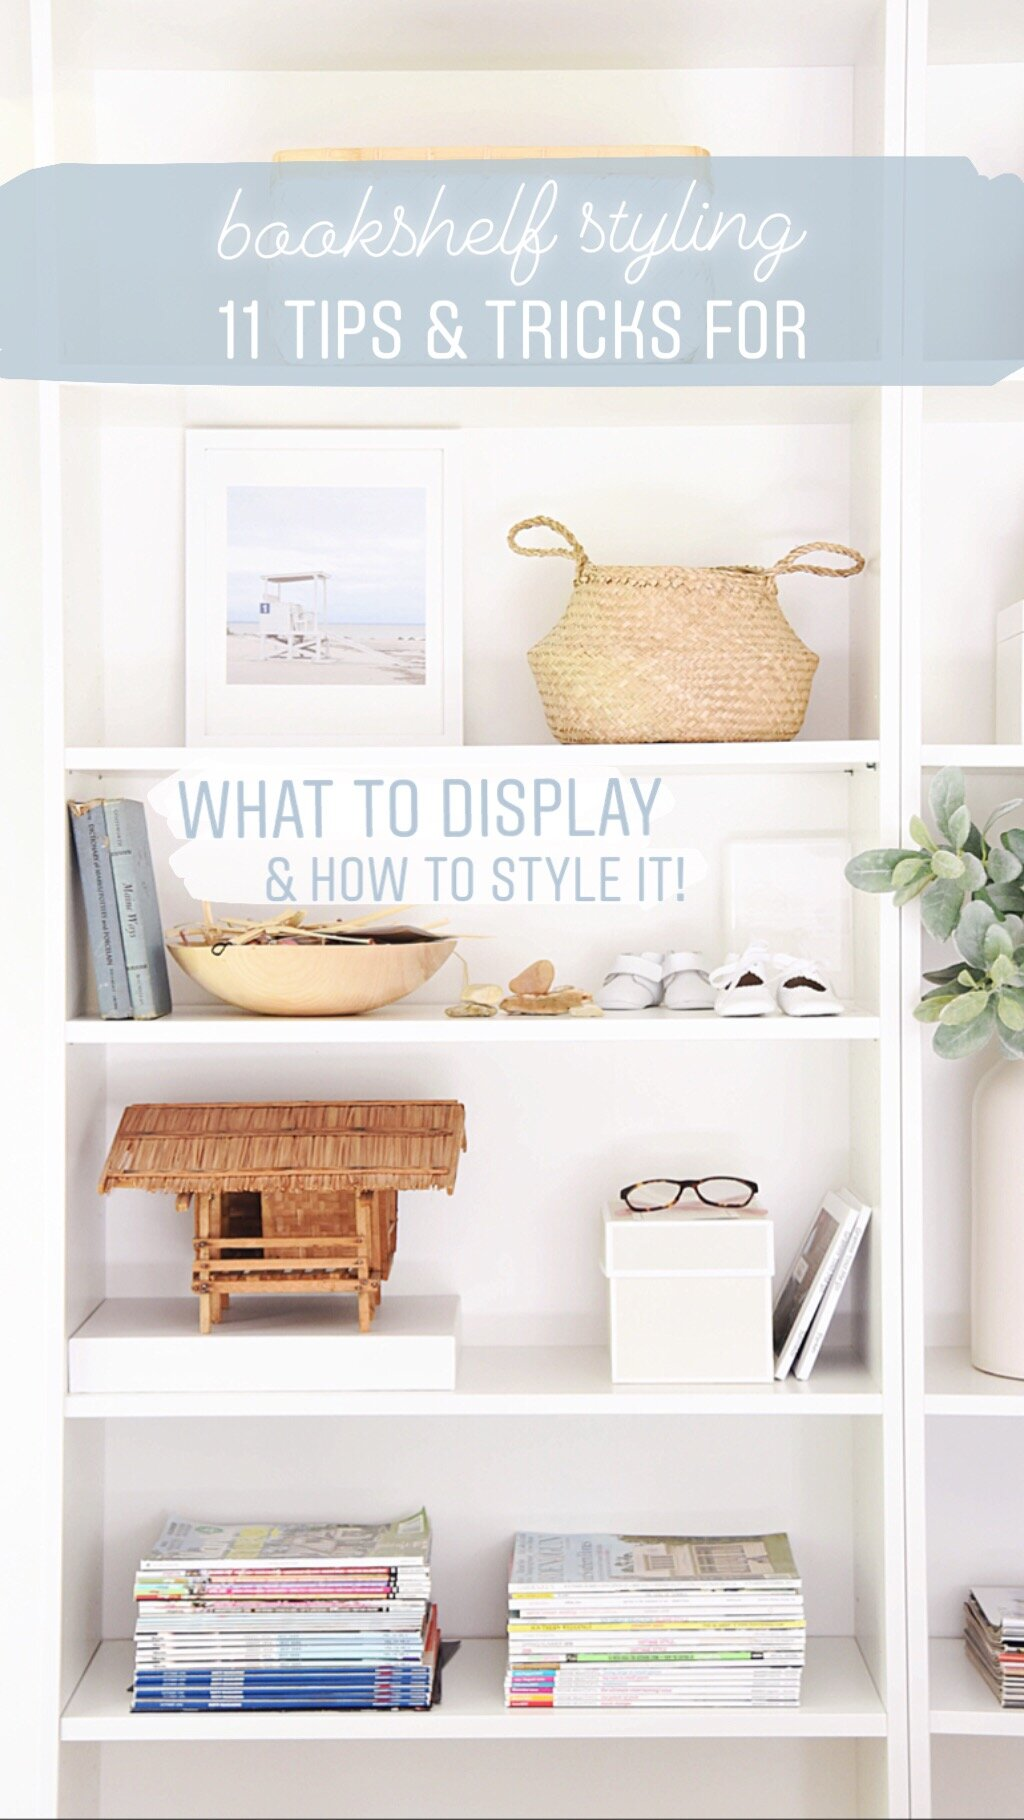 Bookshelf+styling+ideas.jpg